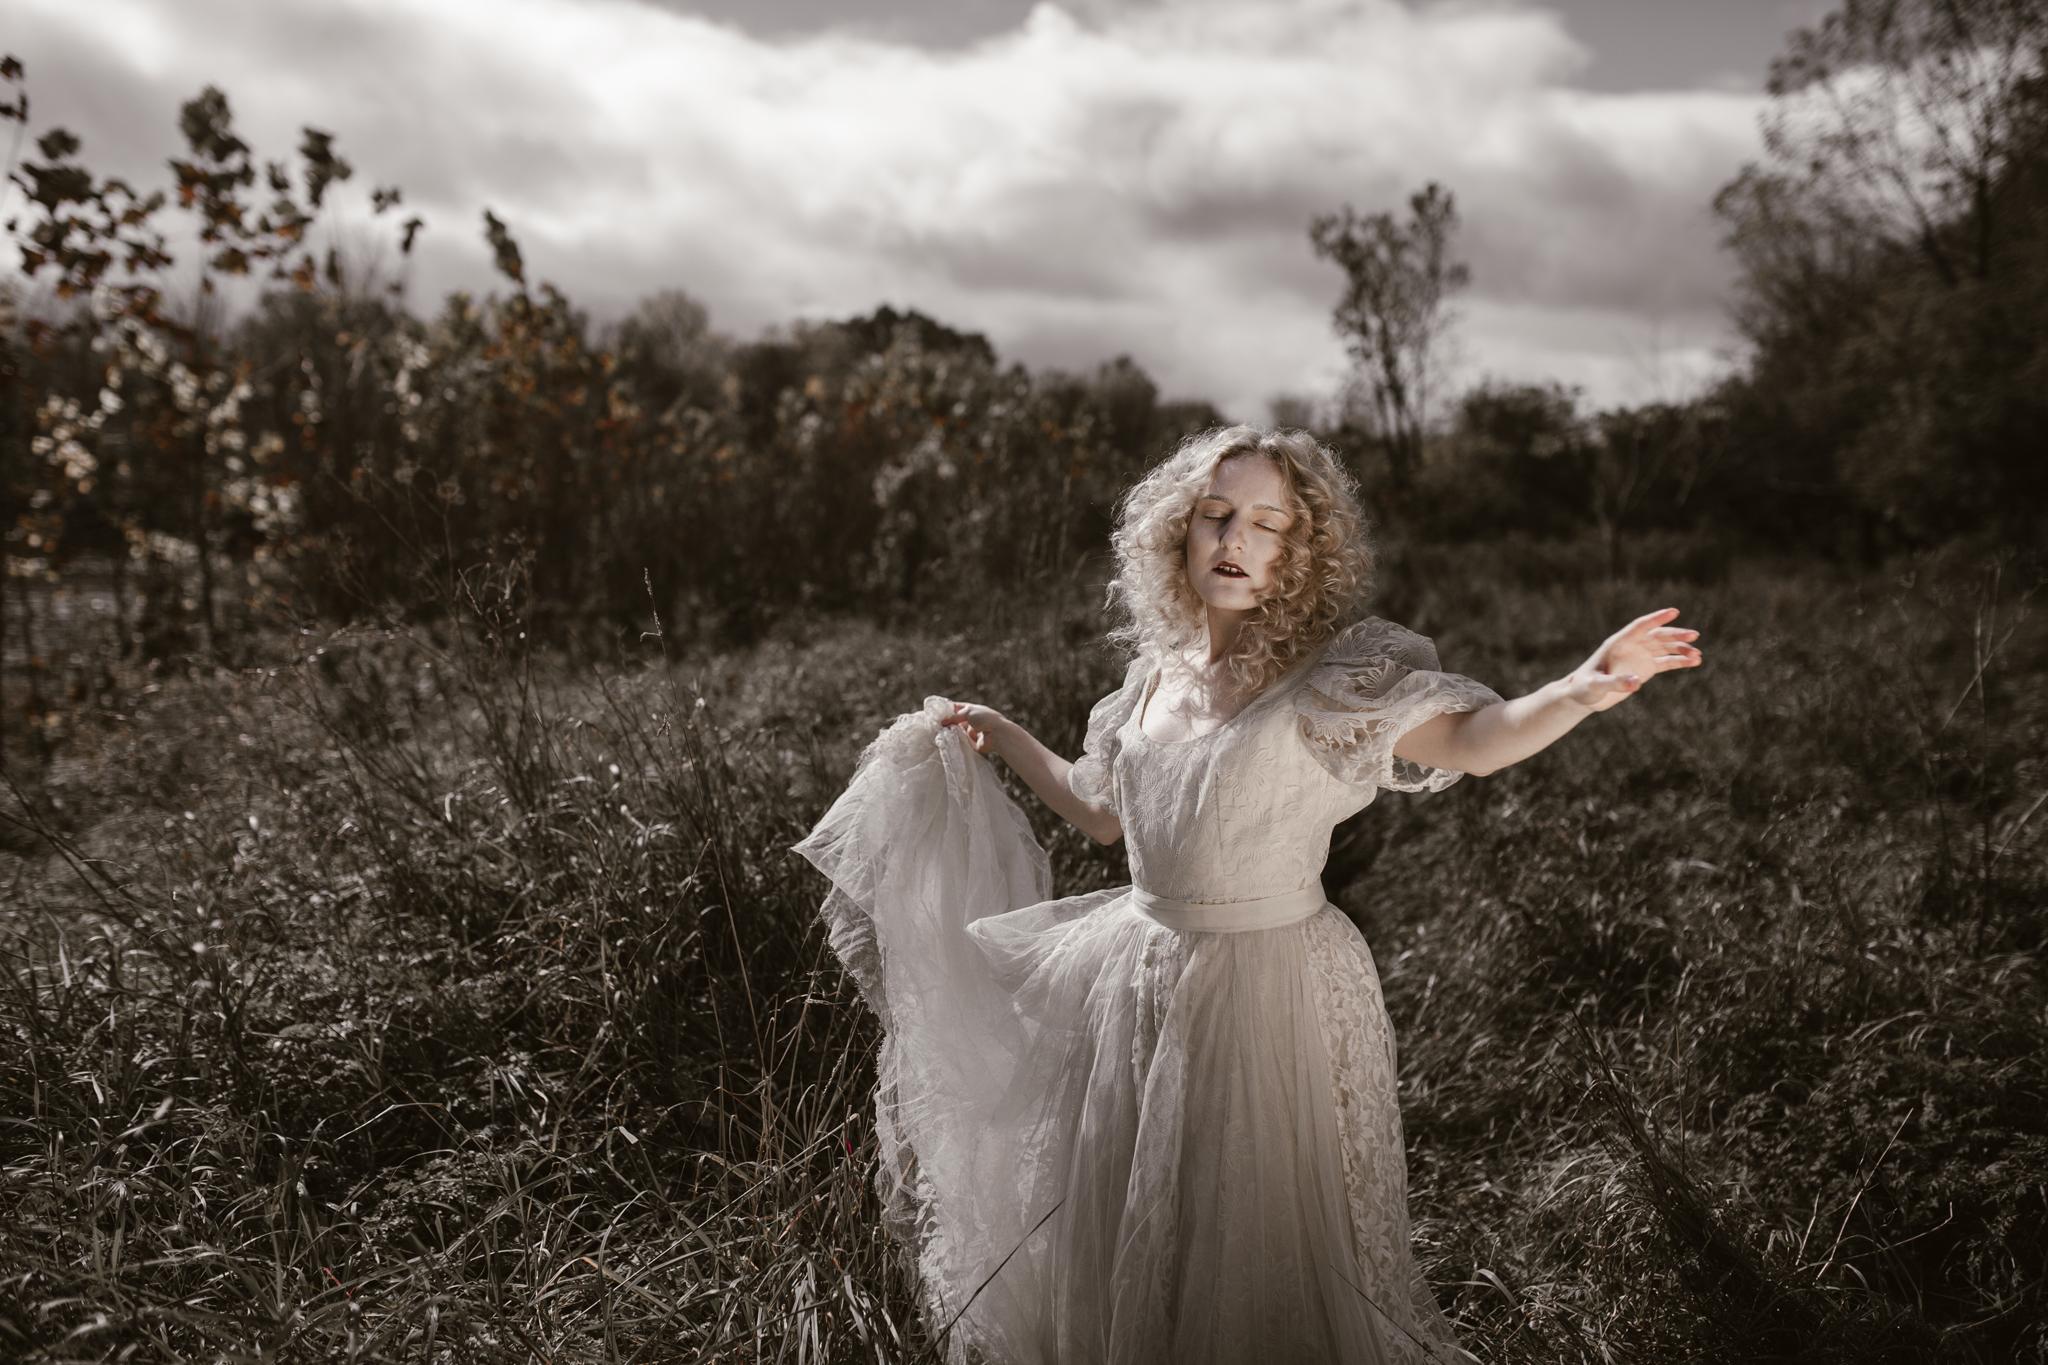 pale-witch-078fb.jpg